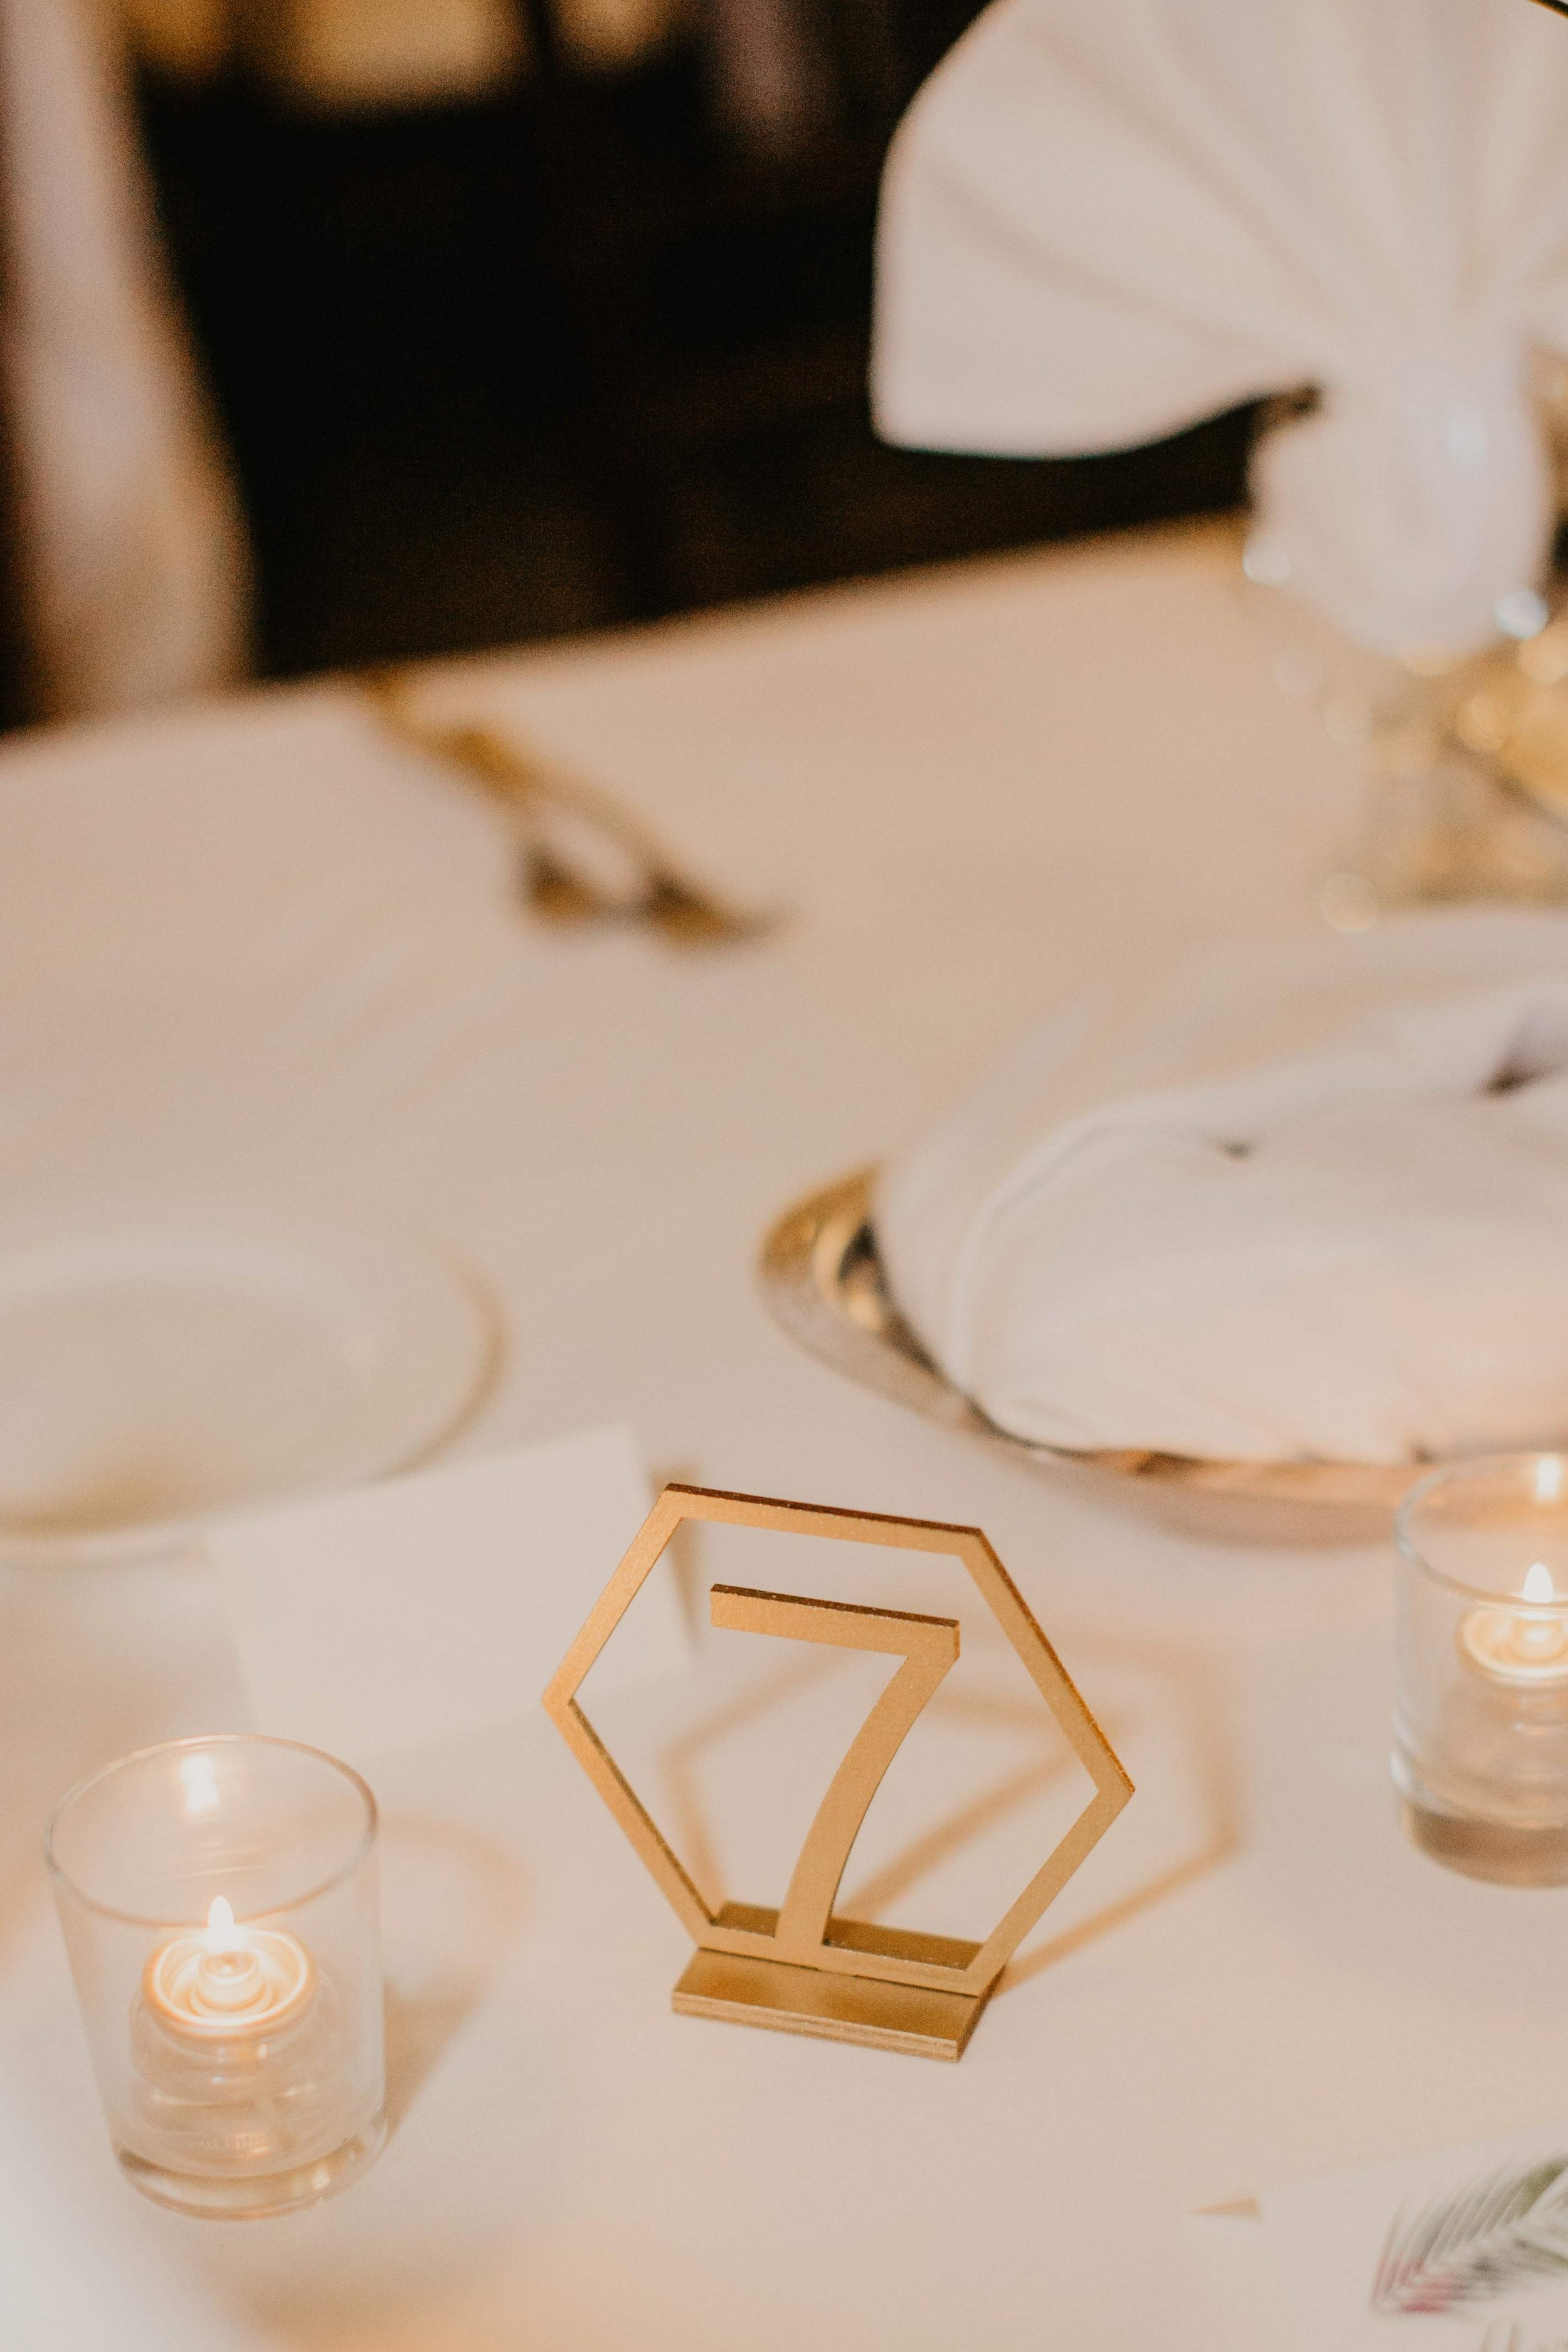 www.santabarbarawedding.com | Candice Marie Photography | Hilton Santa Barbara Beachfront Resort | Dalina Klan | Once in a Lifetime Weddings | Reception Table Numbers